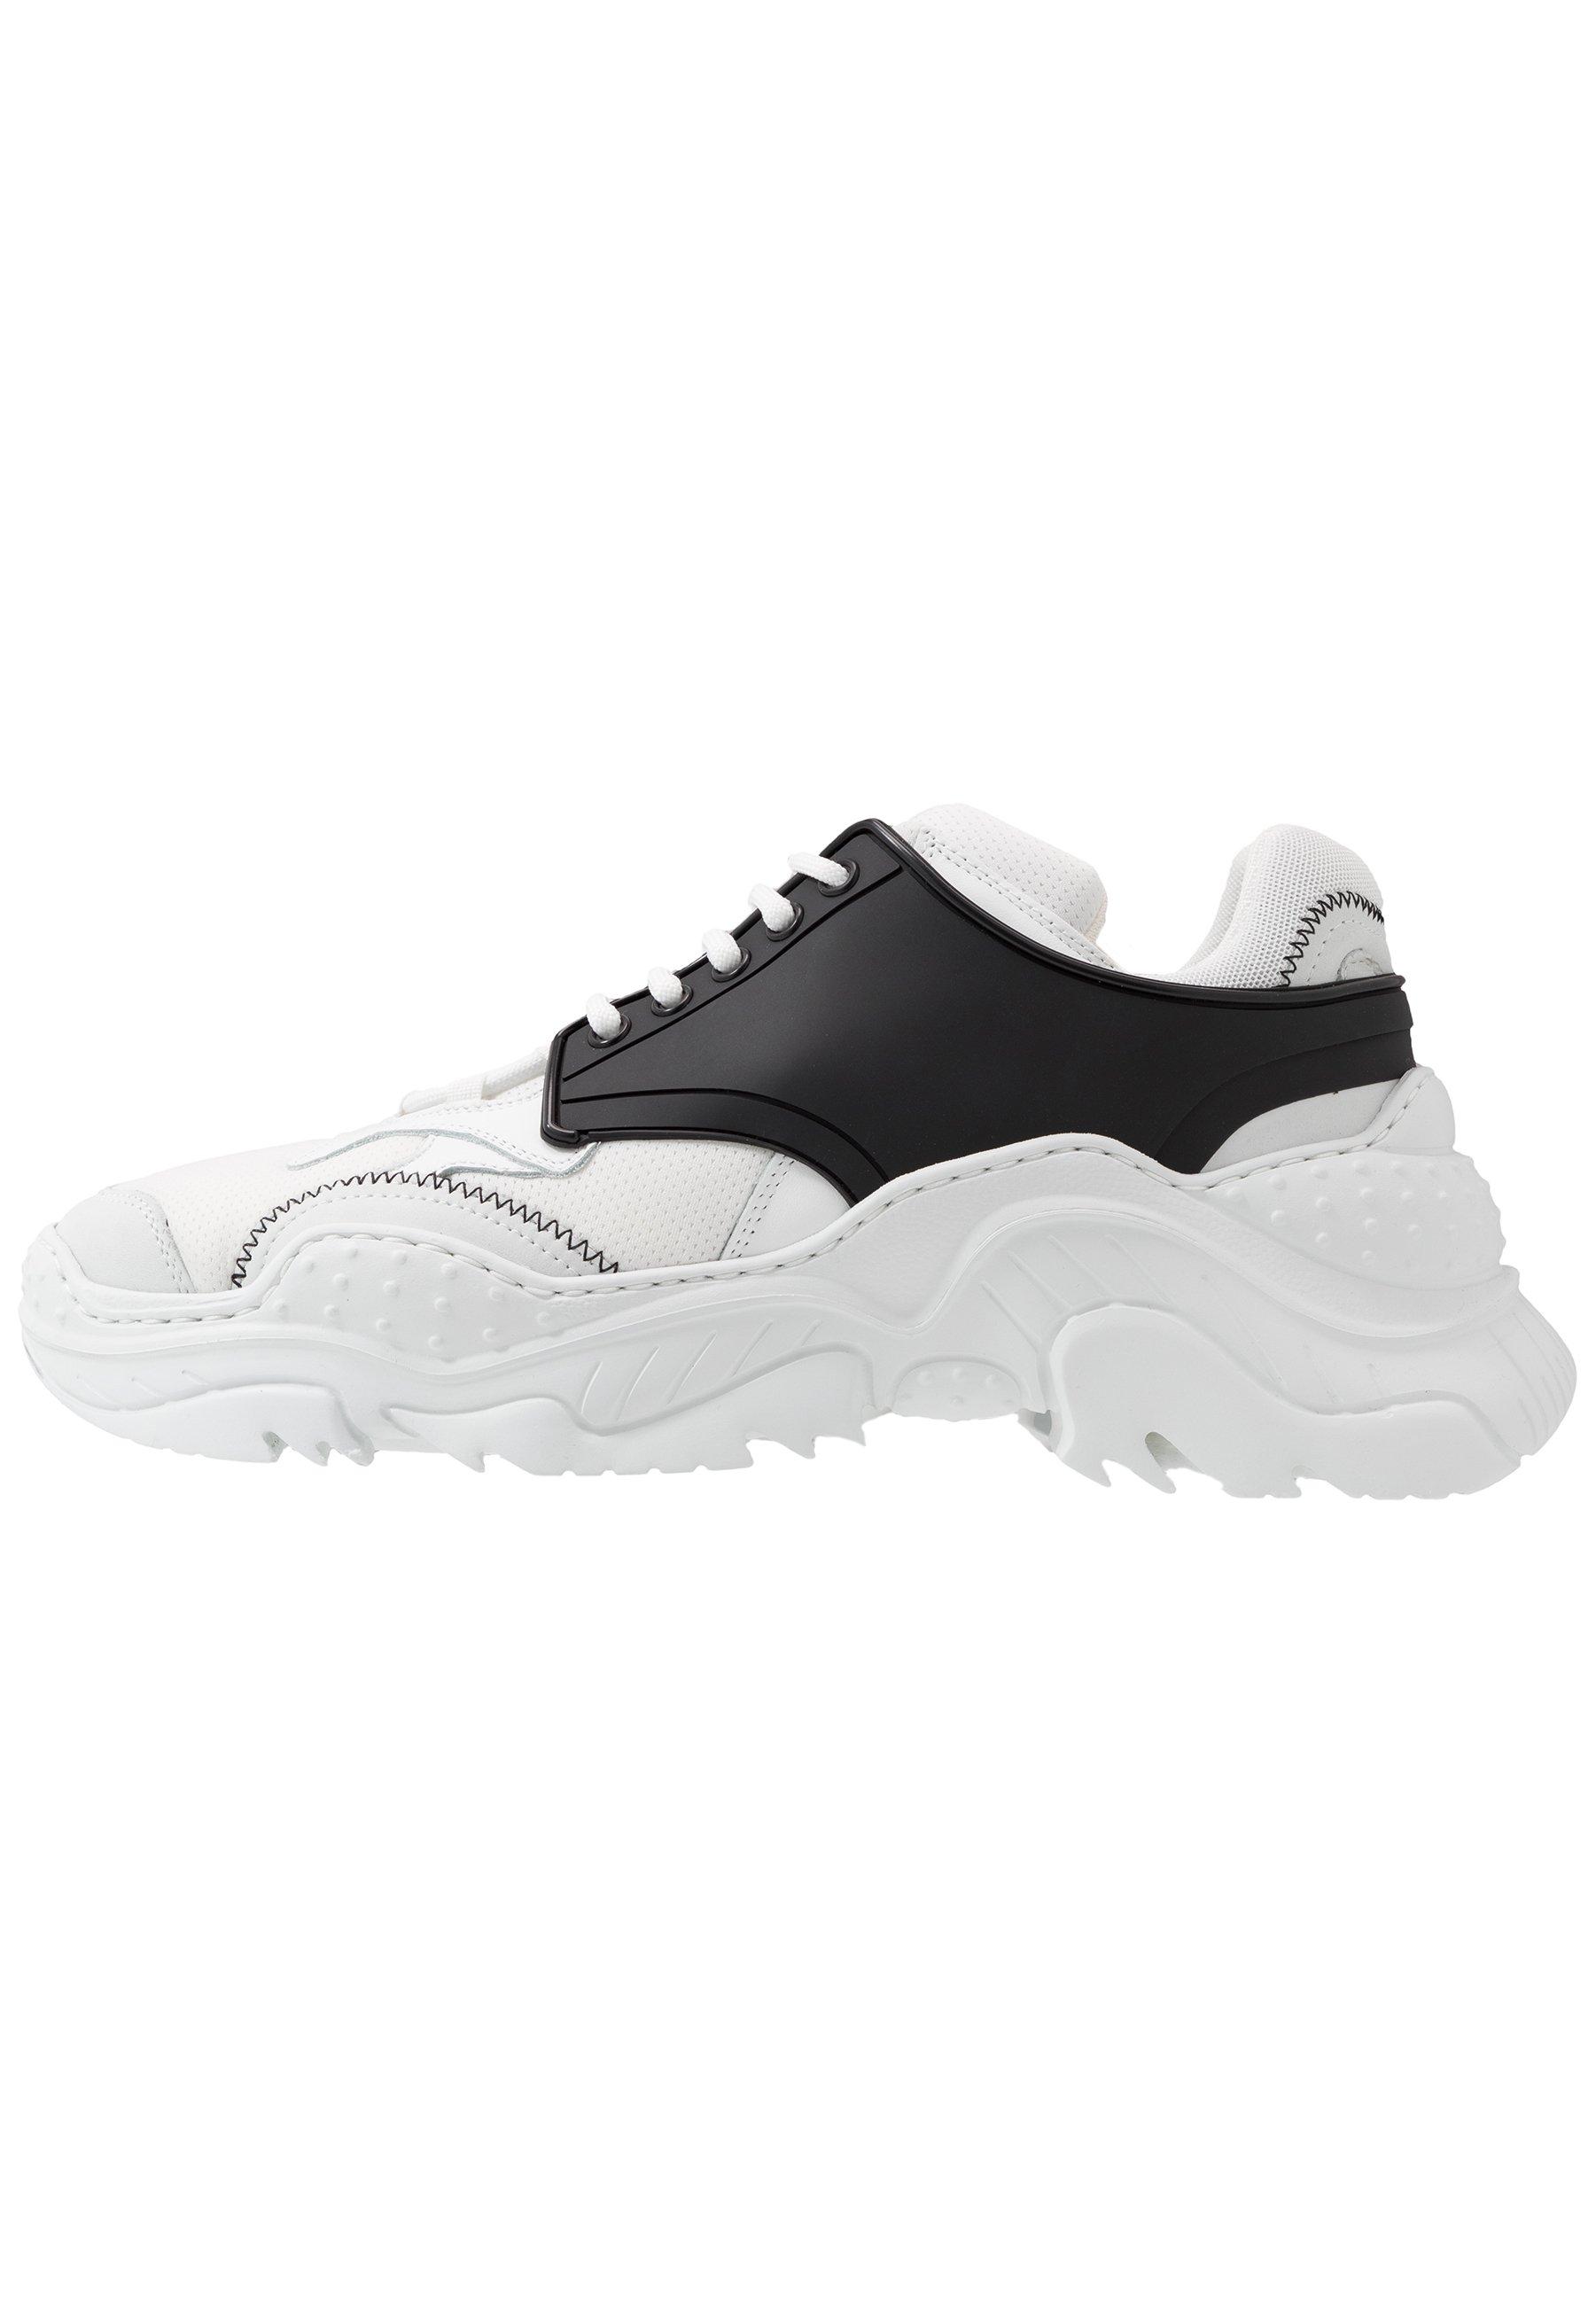 N??21 Billy - Sneakers Basse White/black ATtYqYd